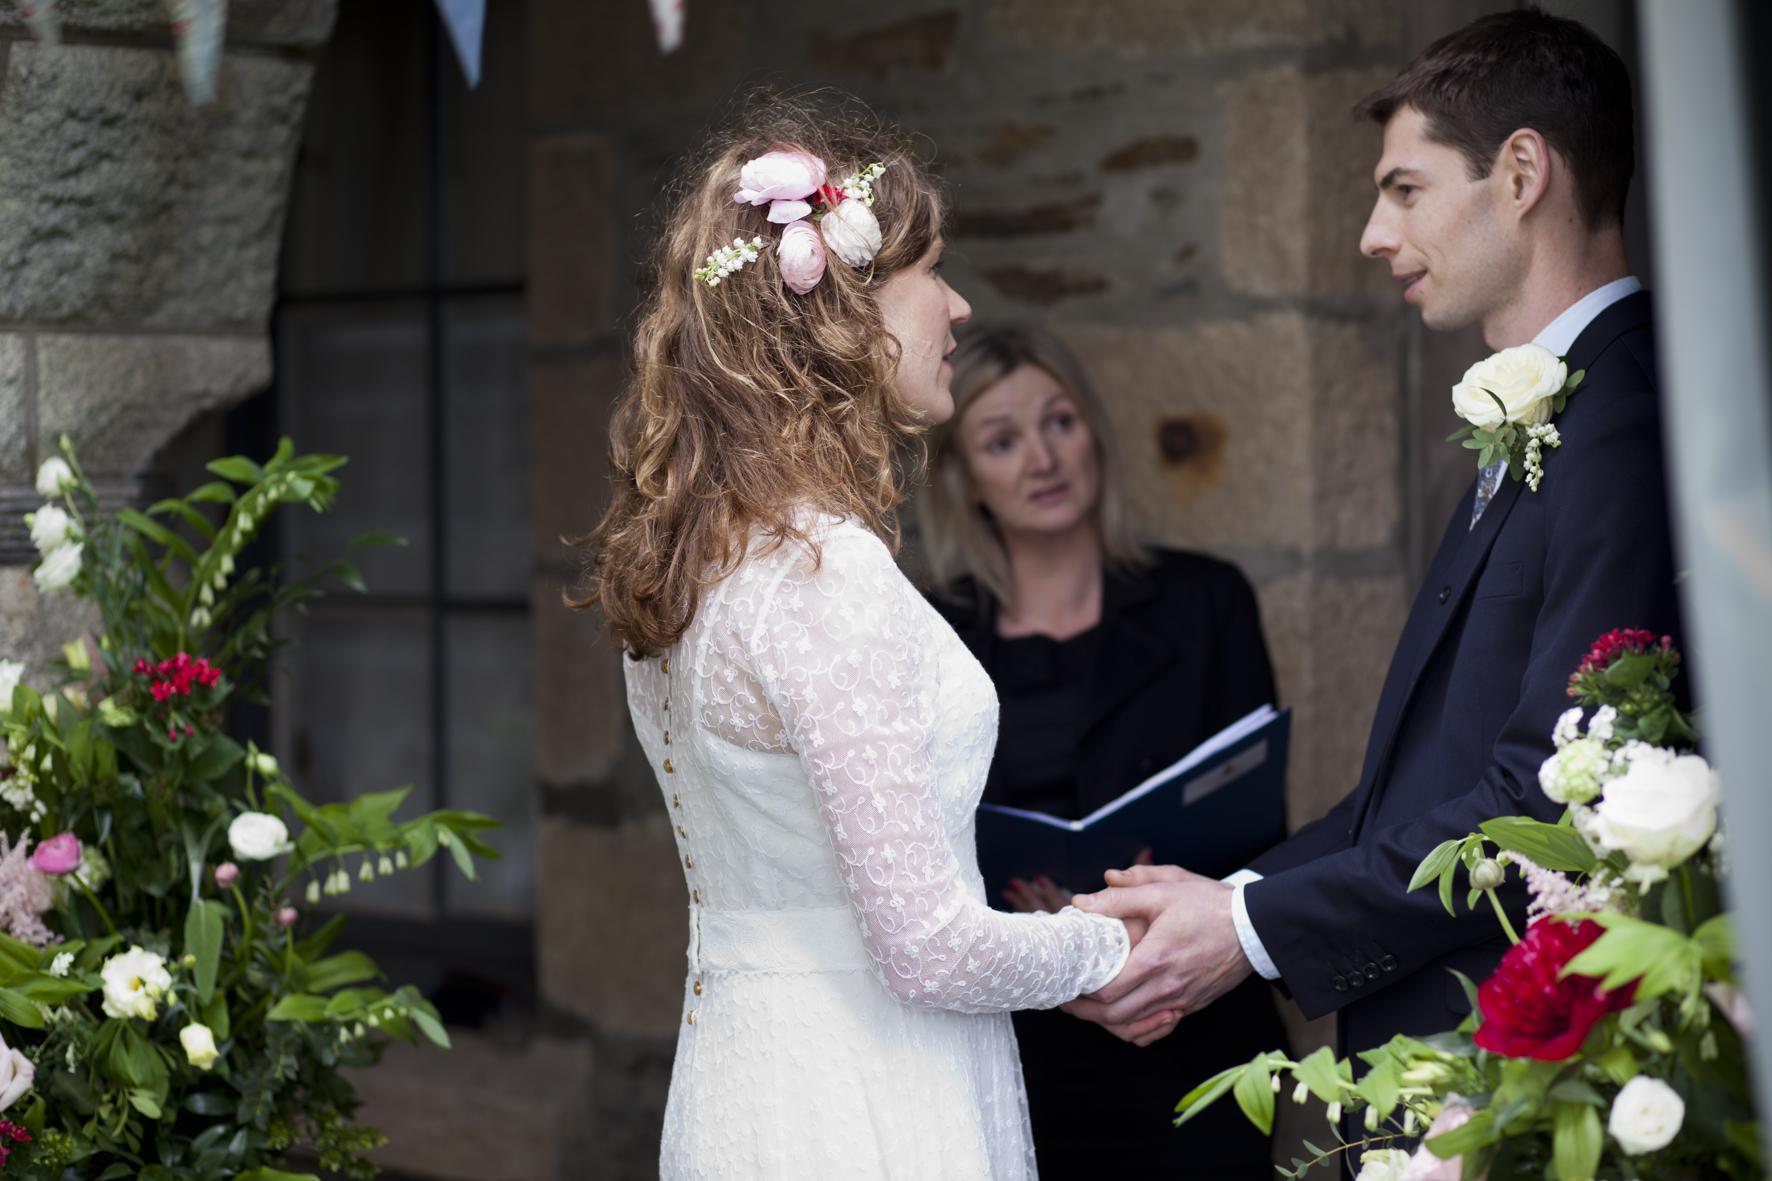 Wedding example_M&P__MG_3377_Claudia Leisinger.jpg